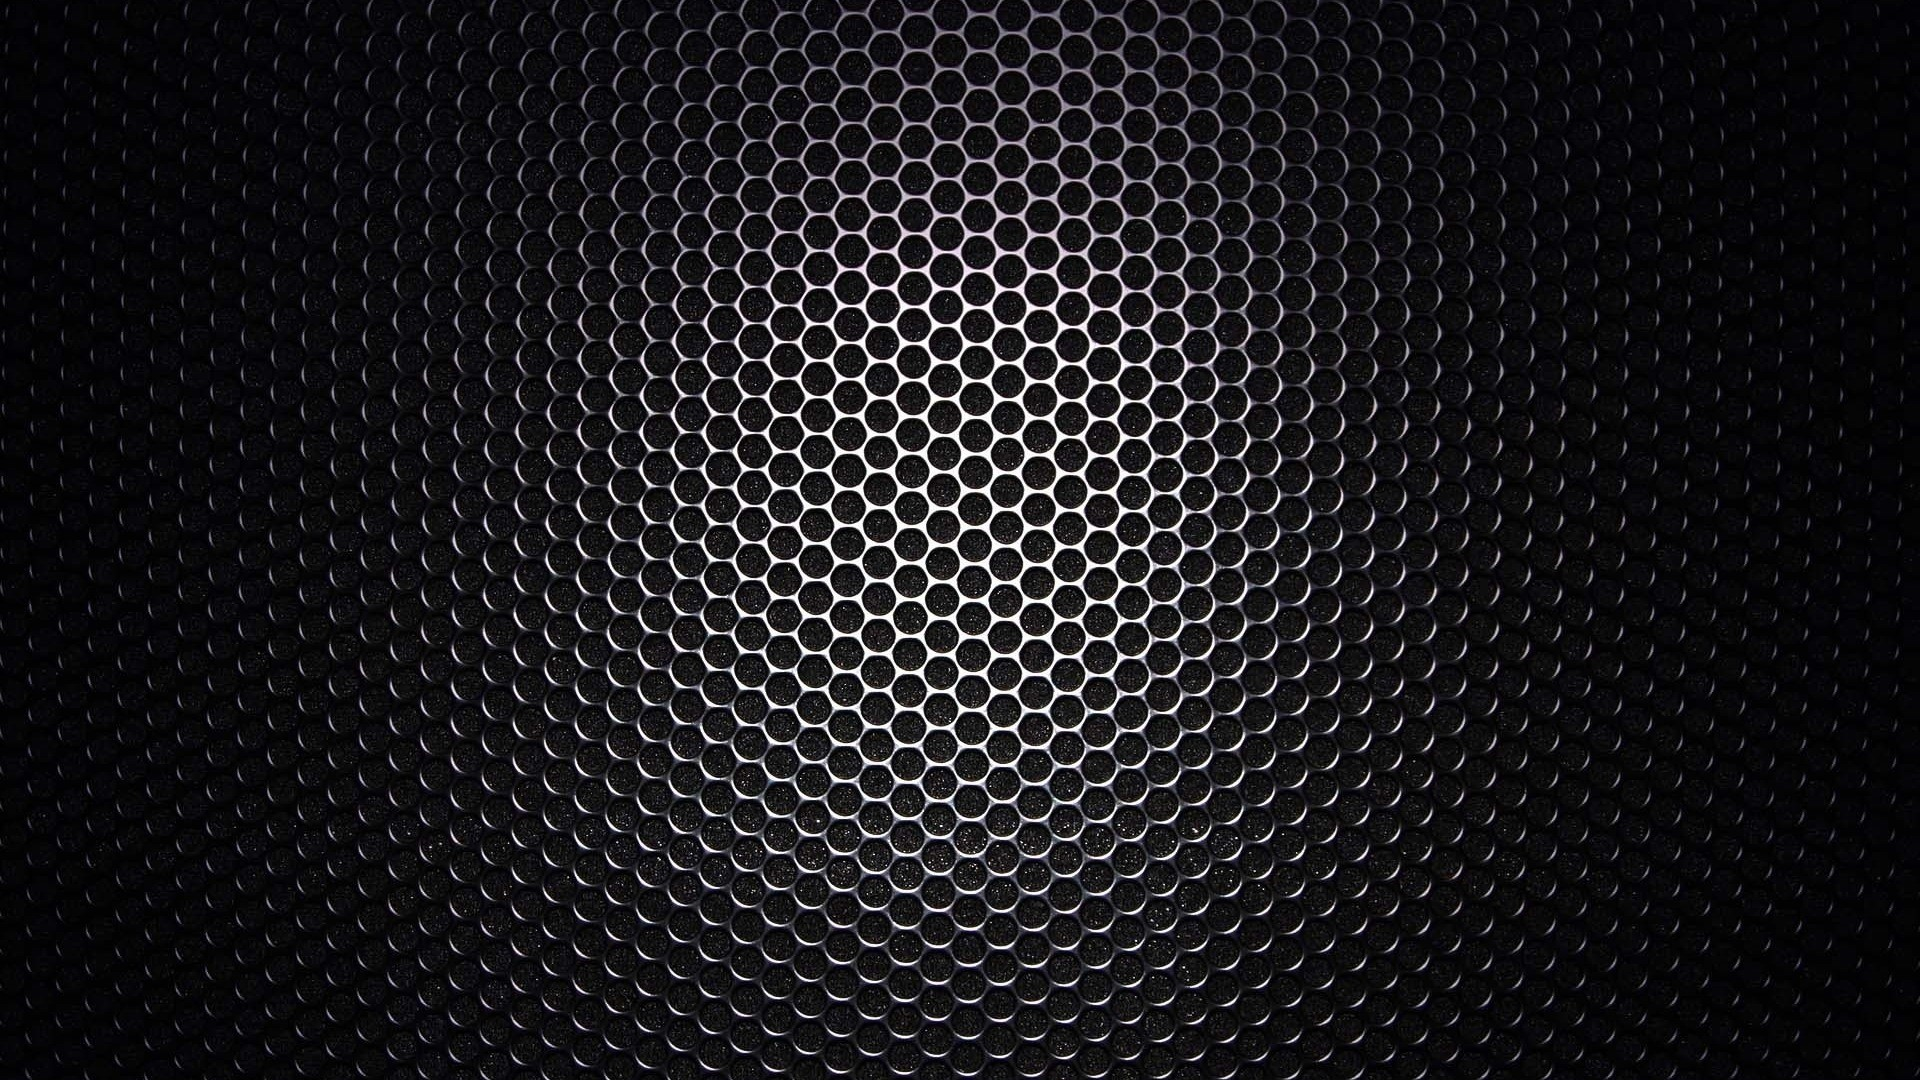 Black Hd Wallpaper 42 Background